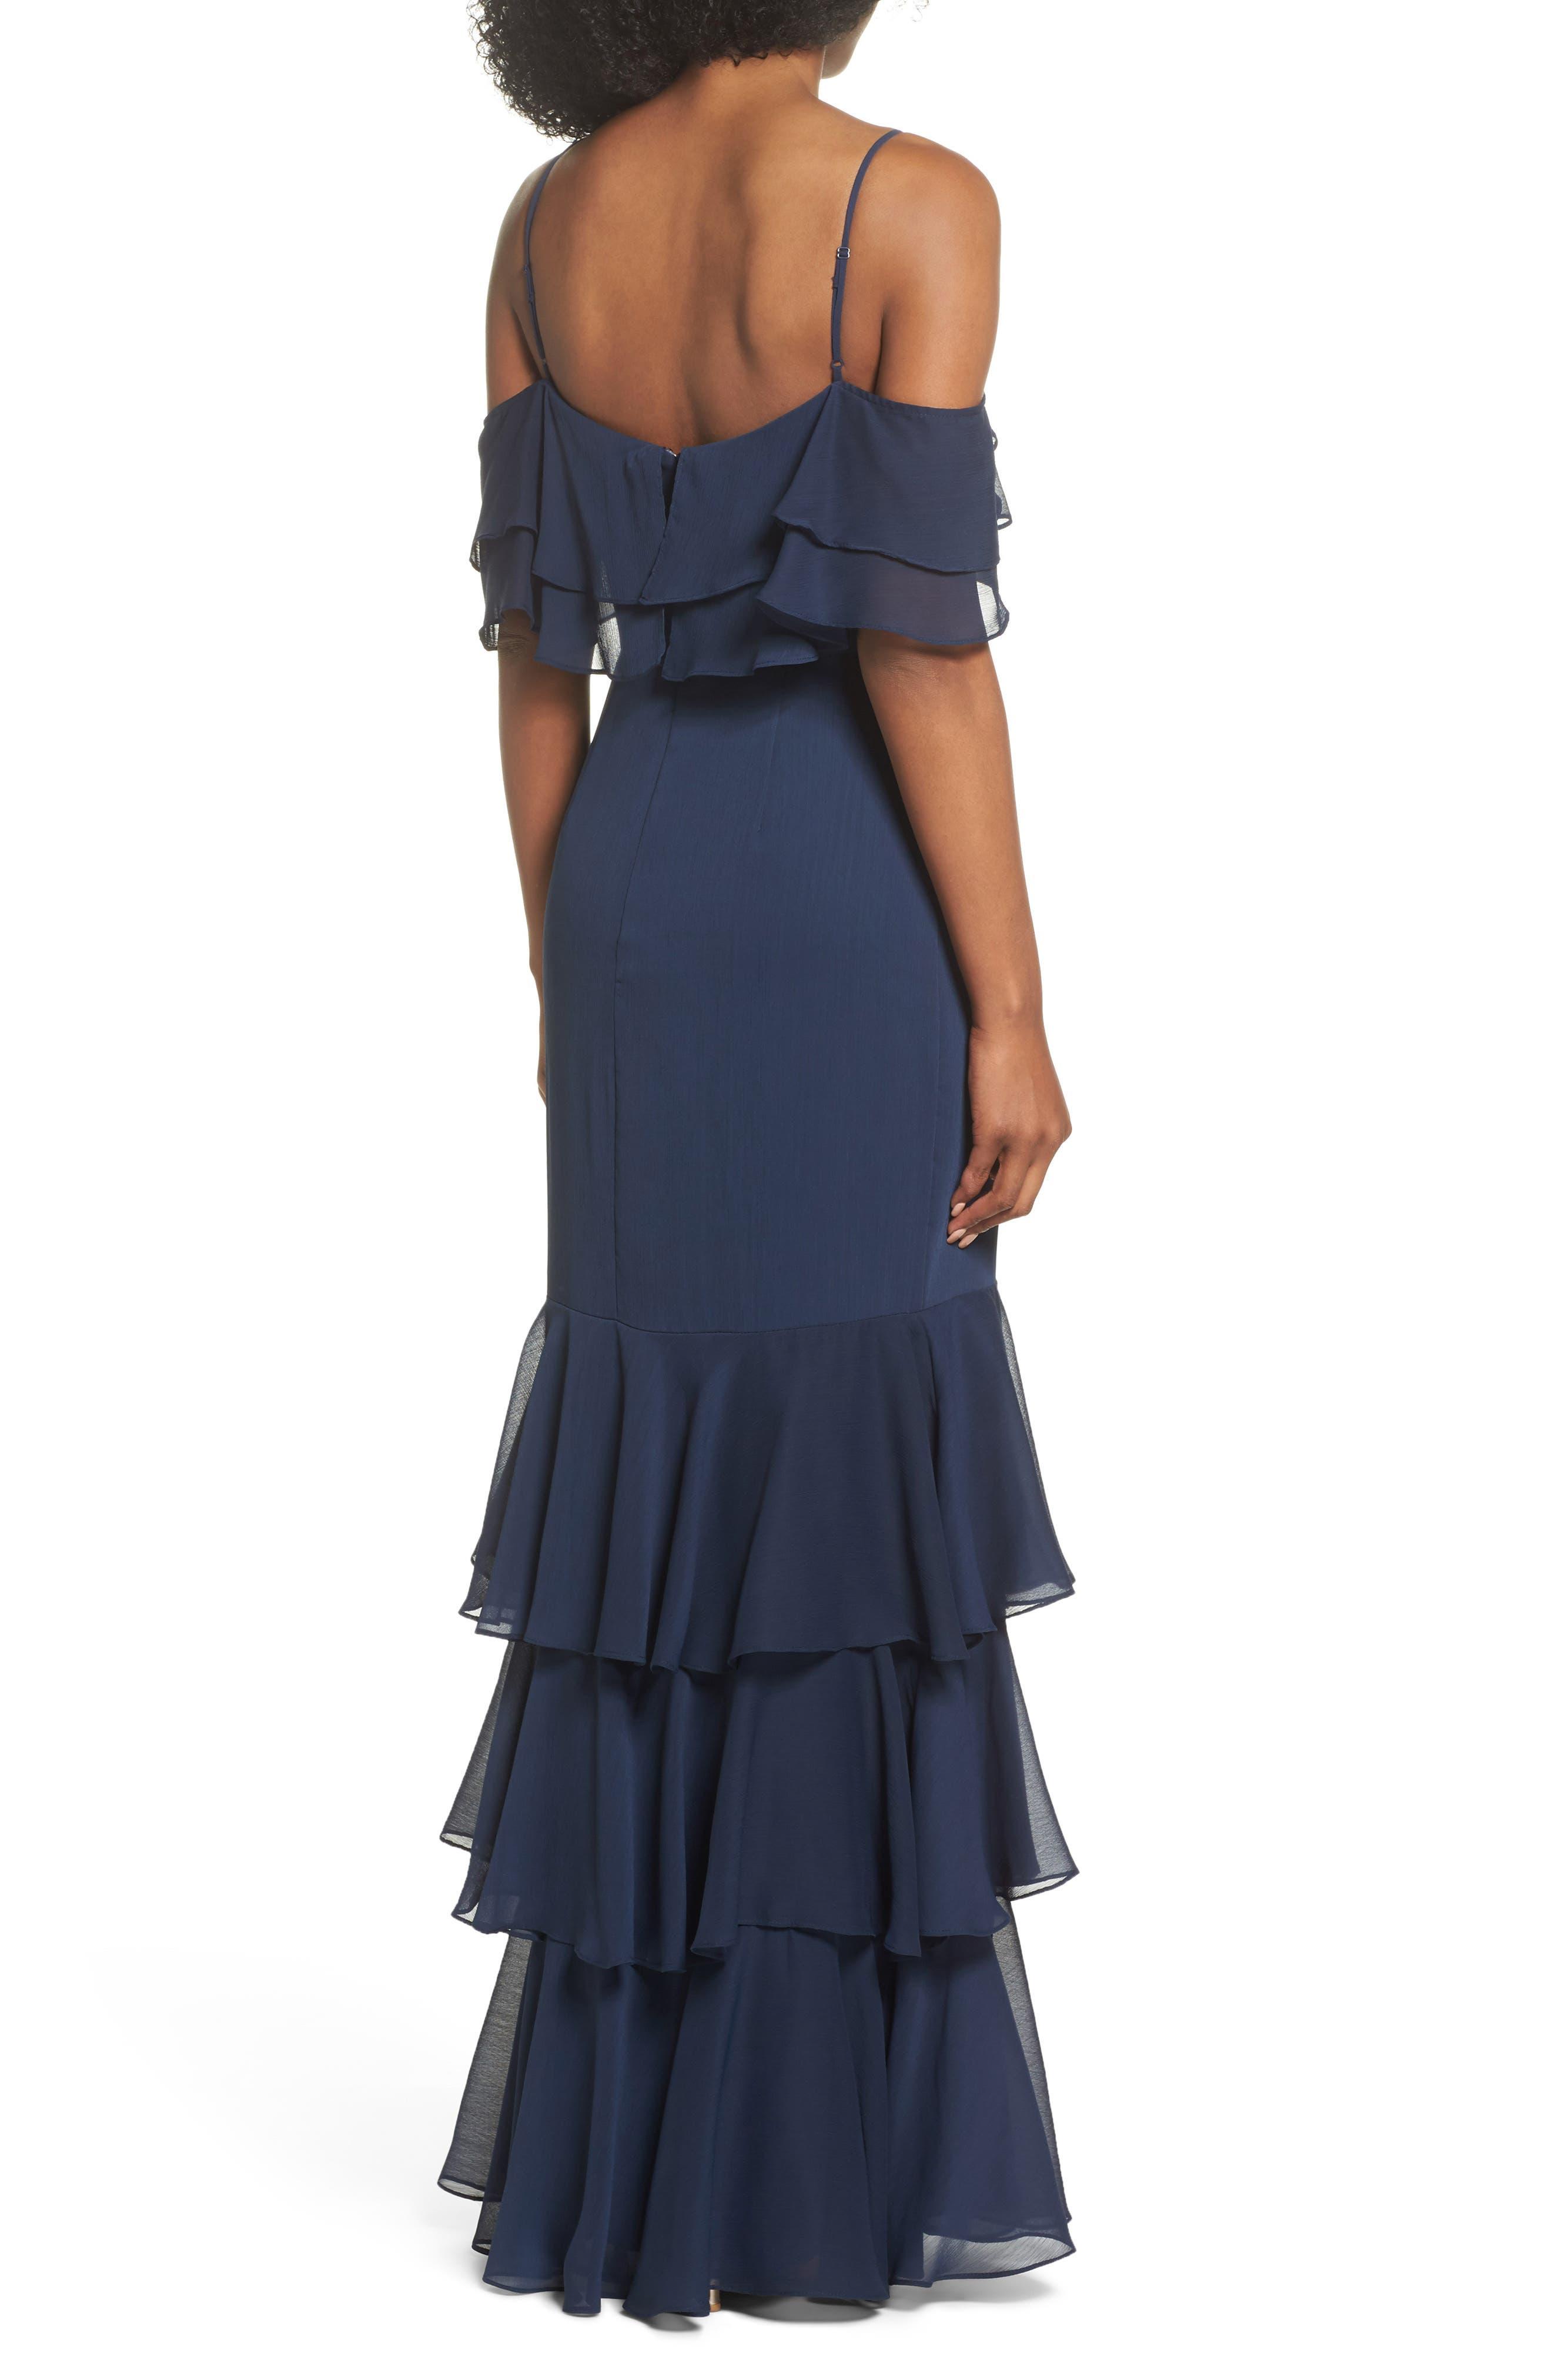 Lauren Cold Shoulder Tiered Gown,                             Alternate thumbnail 2, color,                             Navy